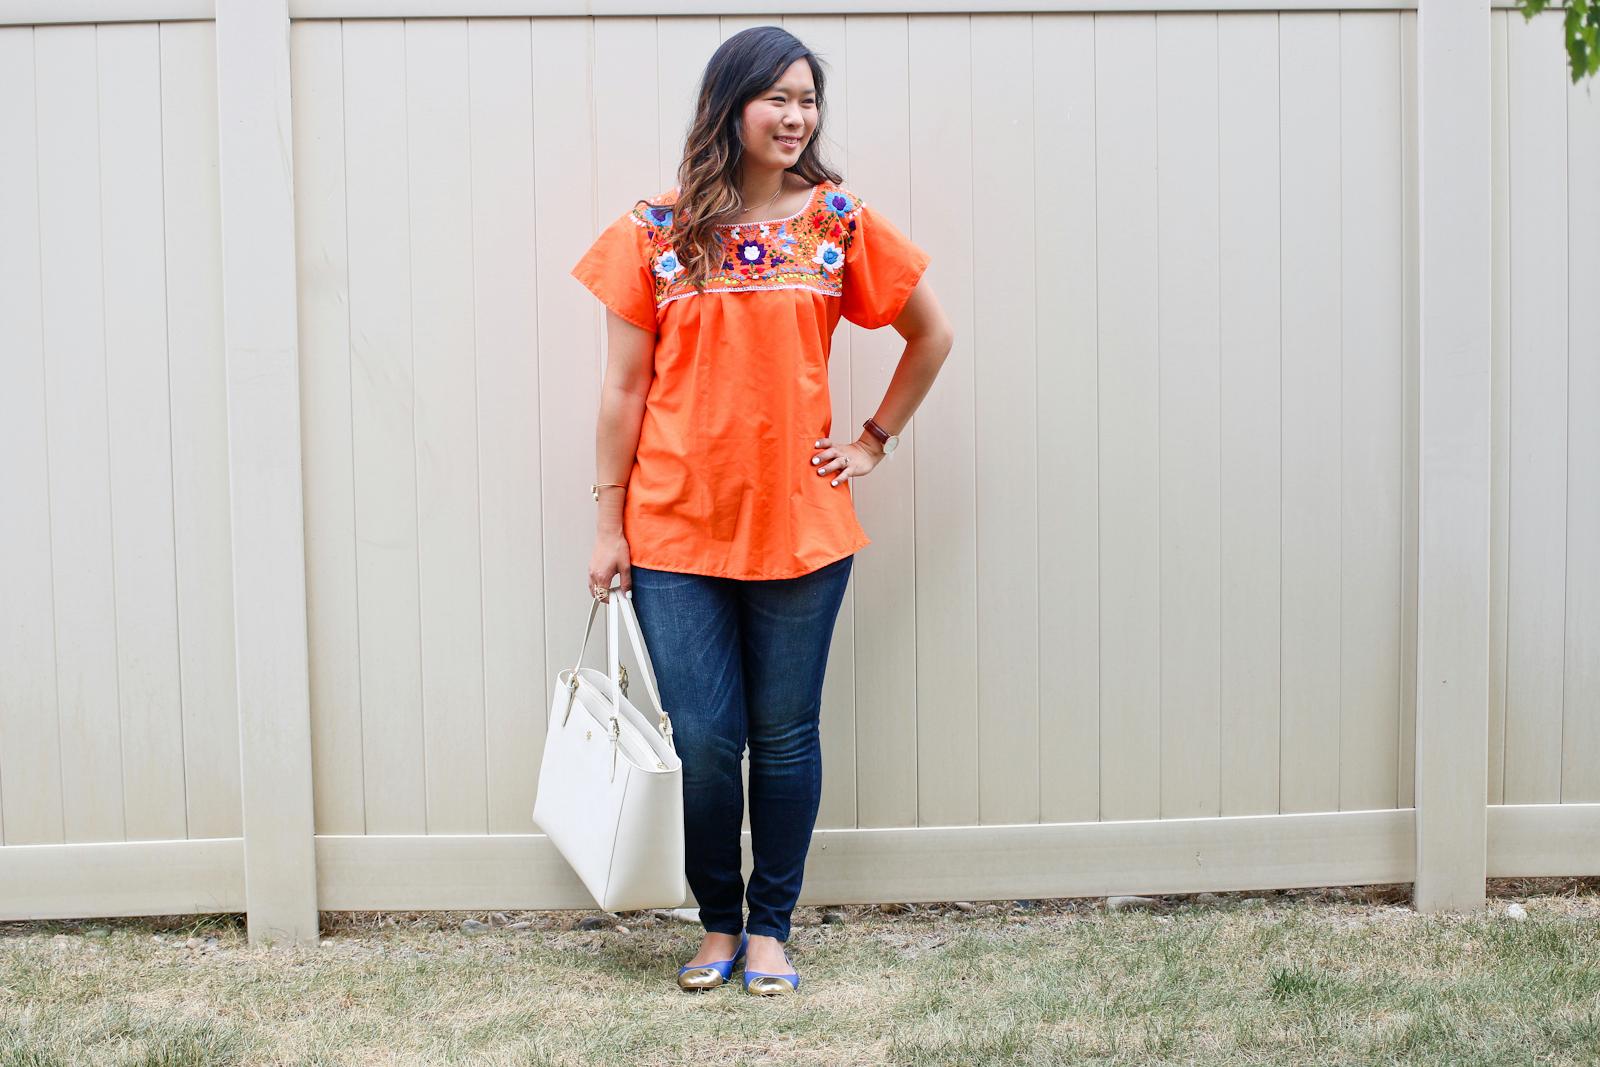 Sandy a la Mode Fashion Blogger Documenting 14 Days of Target Denim